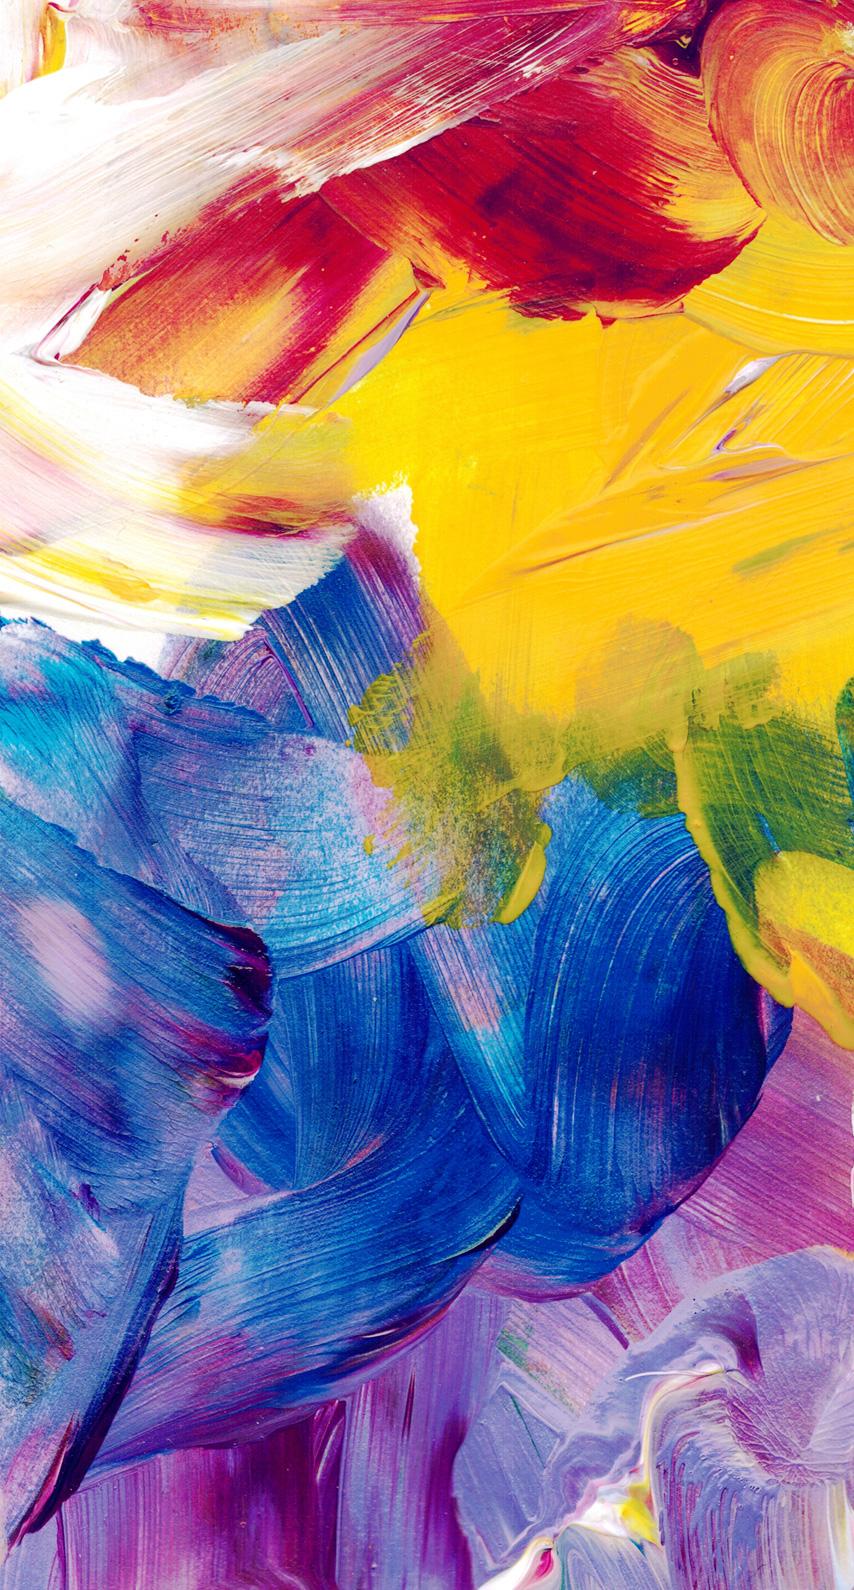 color, creativity